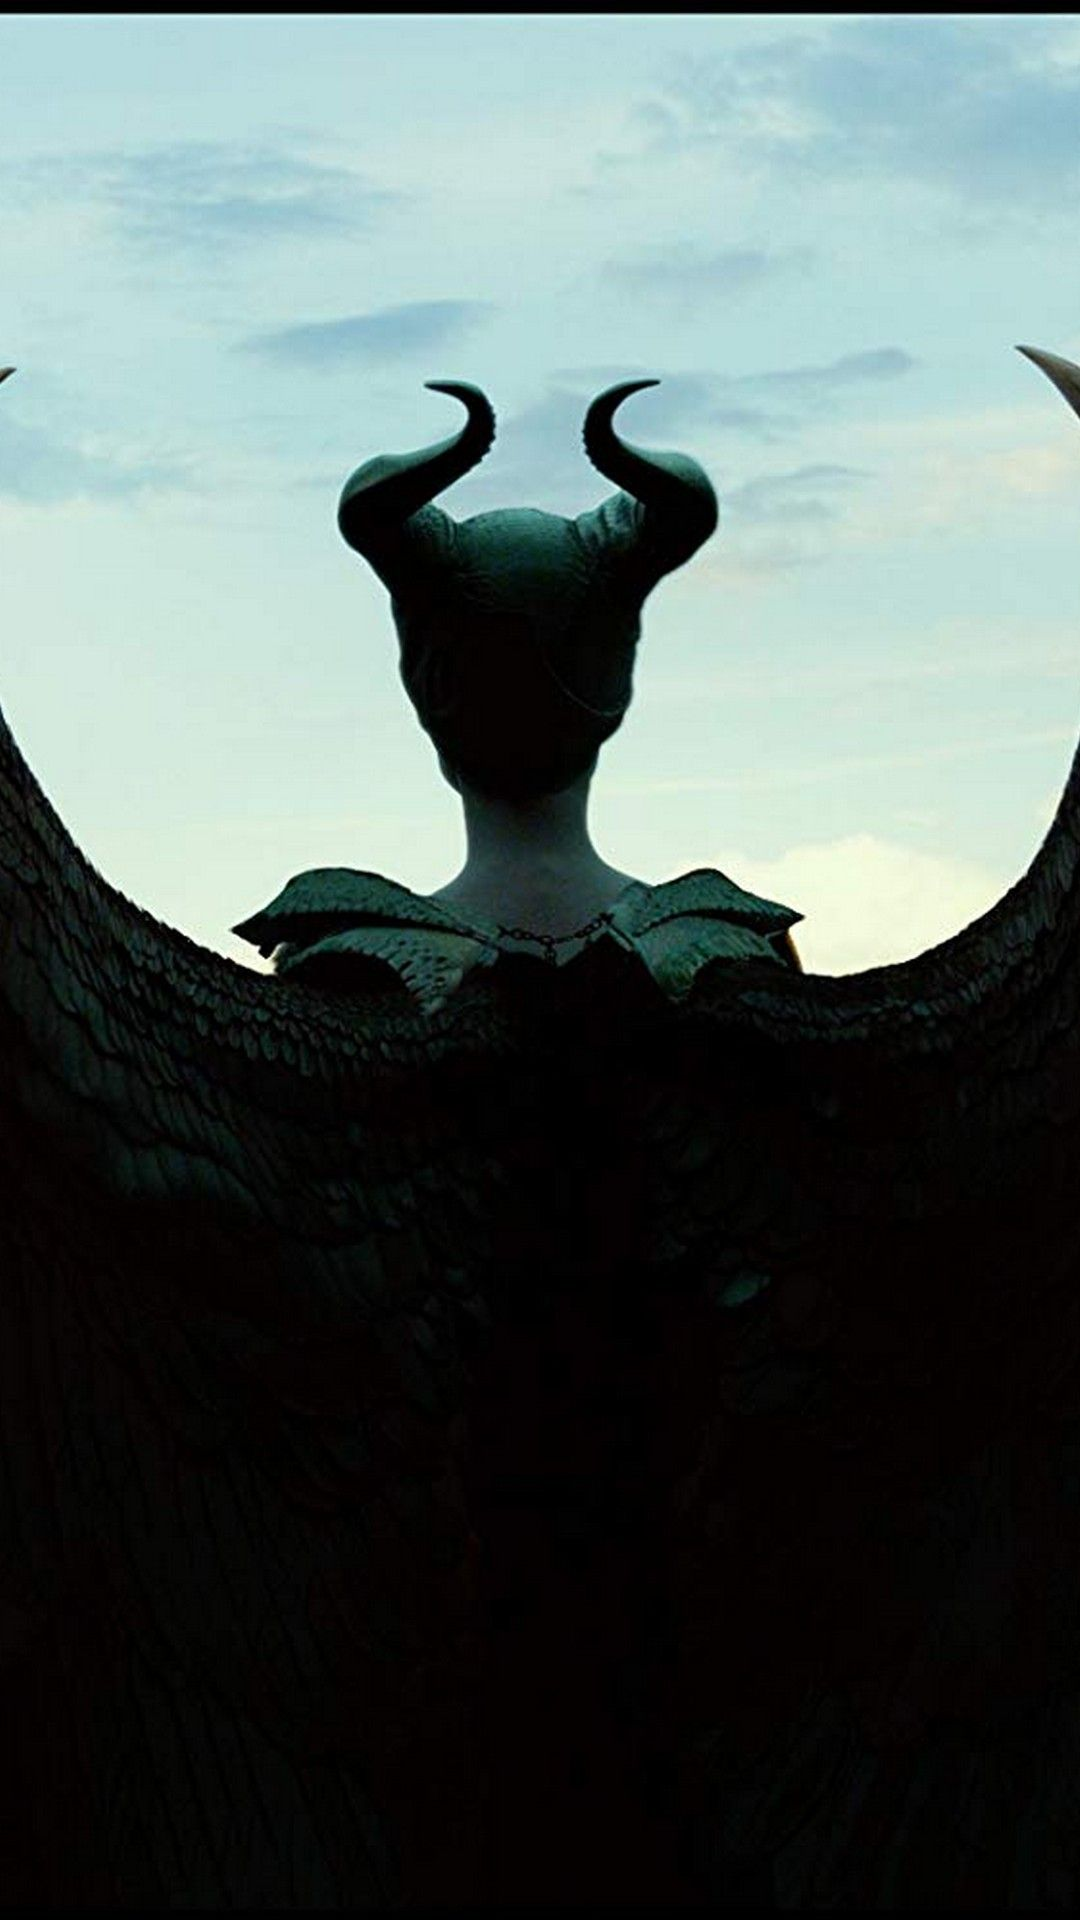 Maleficent Mistress Of Evil Iphone 7 Wallpaper Best Movie Poster Wallpaper Hd Disney Maleficent Maleficent Maleficent 2